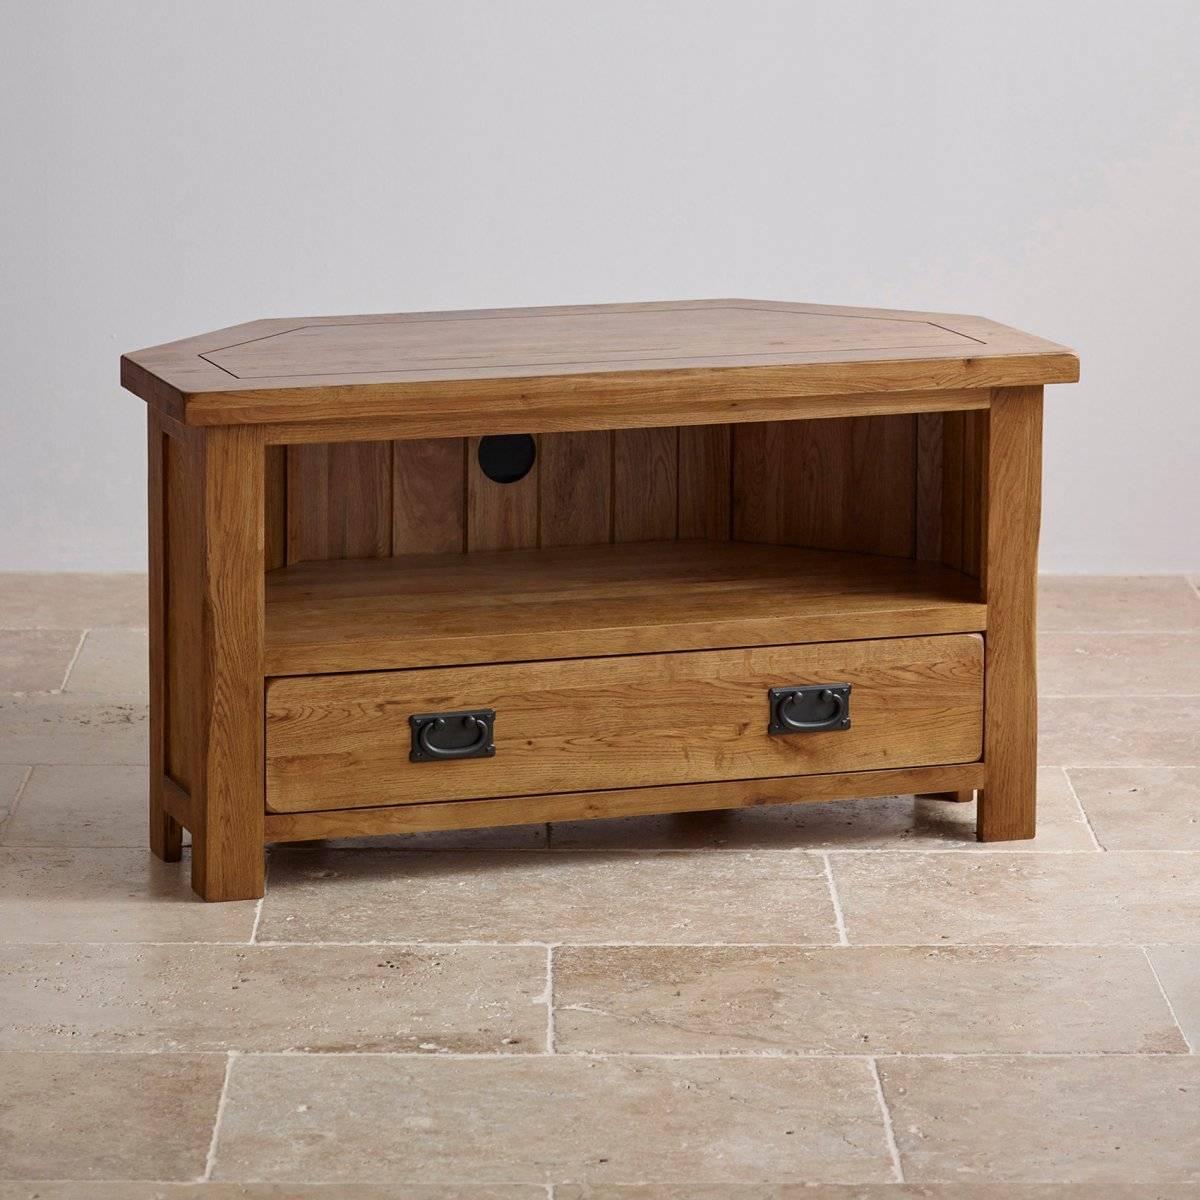 Original Rustic Corner Tv Cabinet In Solid Oak intended for Rustic Corner Tv Cabinets (Image 5 of 15)